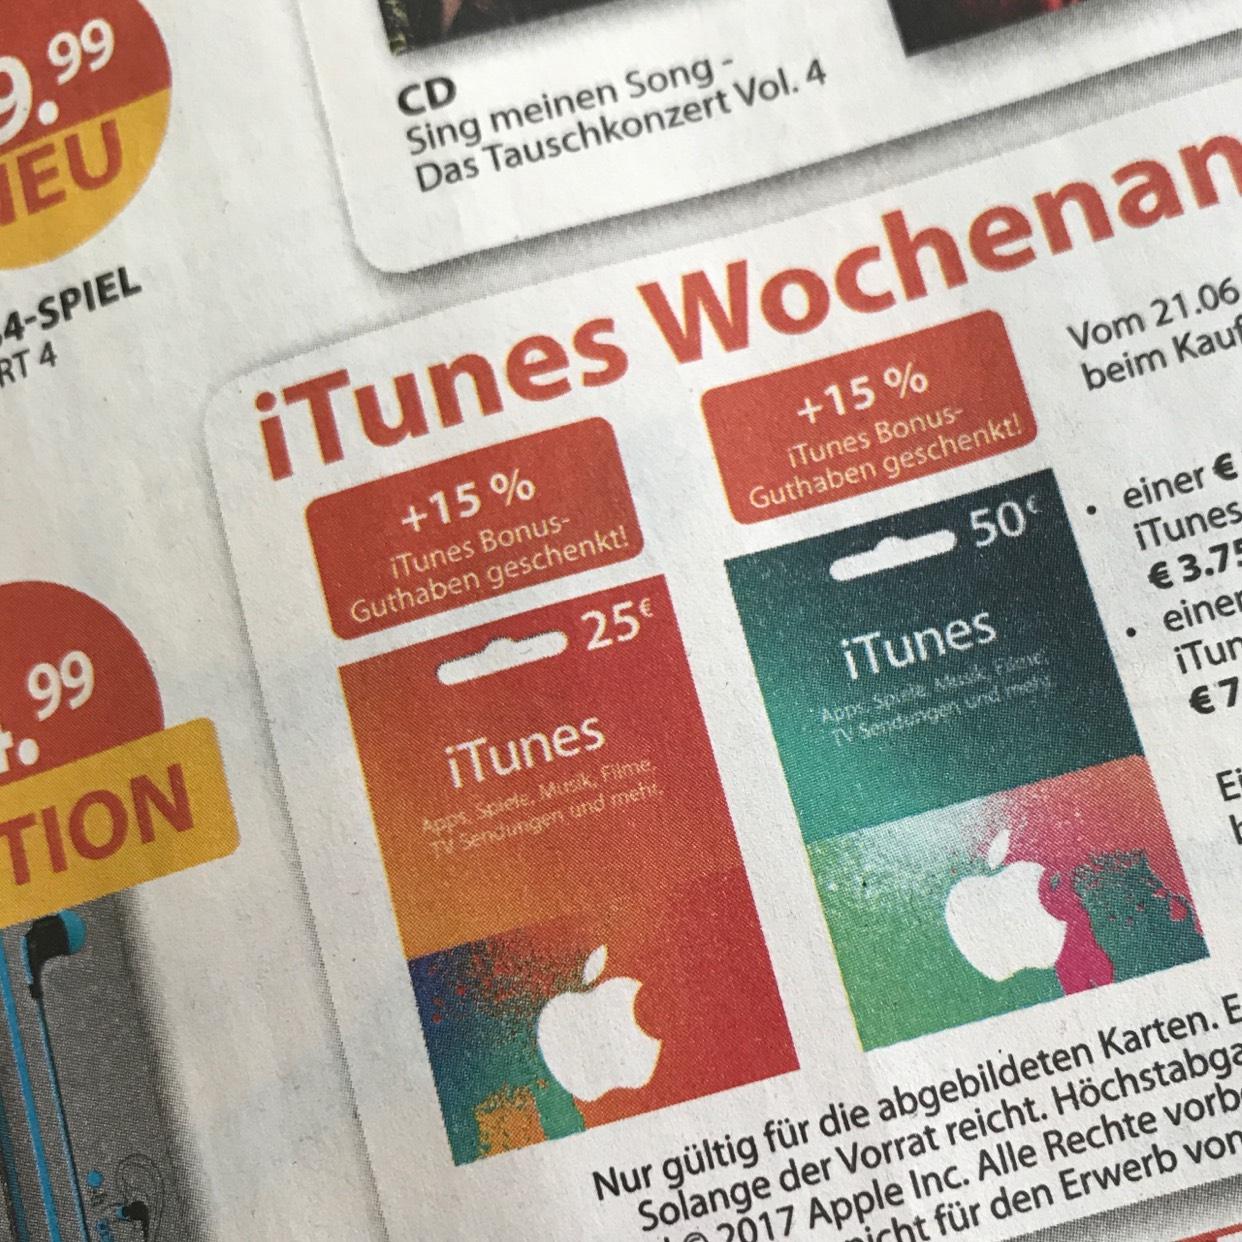 MÜLLER iTunes Wochenangebot